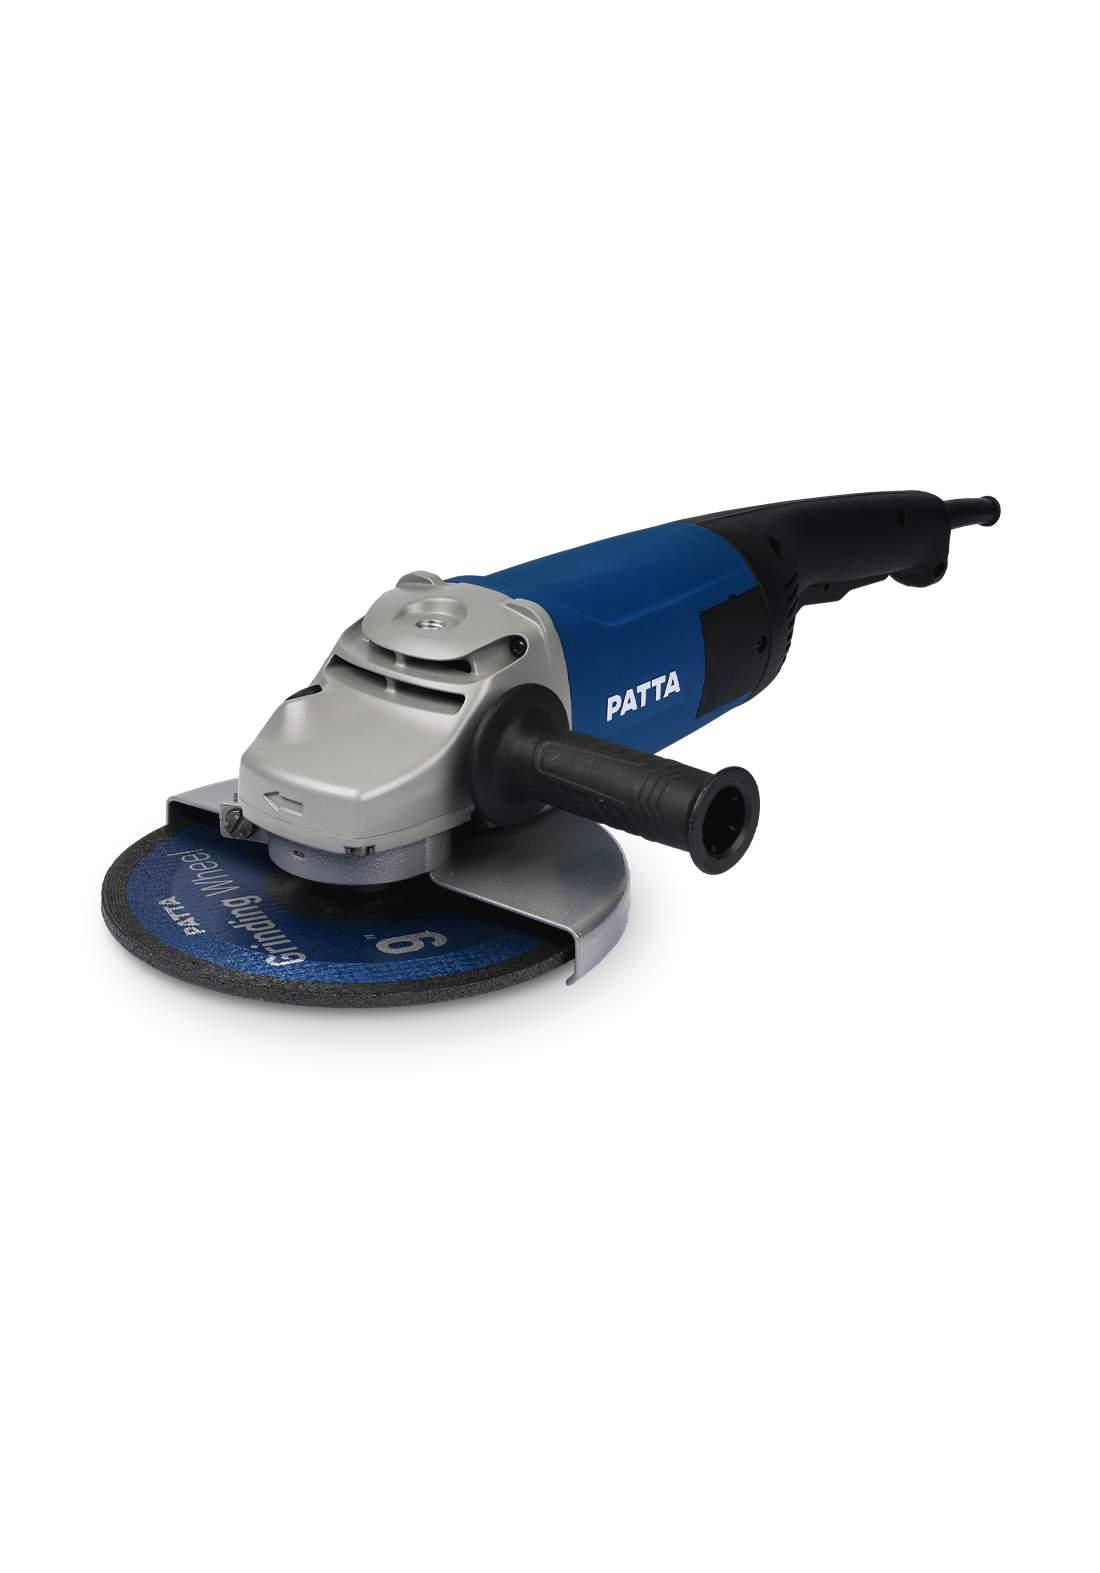 Patta AAG20-230 Angle Grinder 2200 W 230 mm كوسرة زاوية